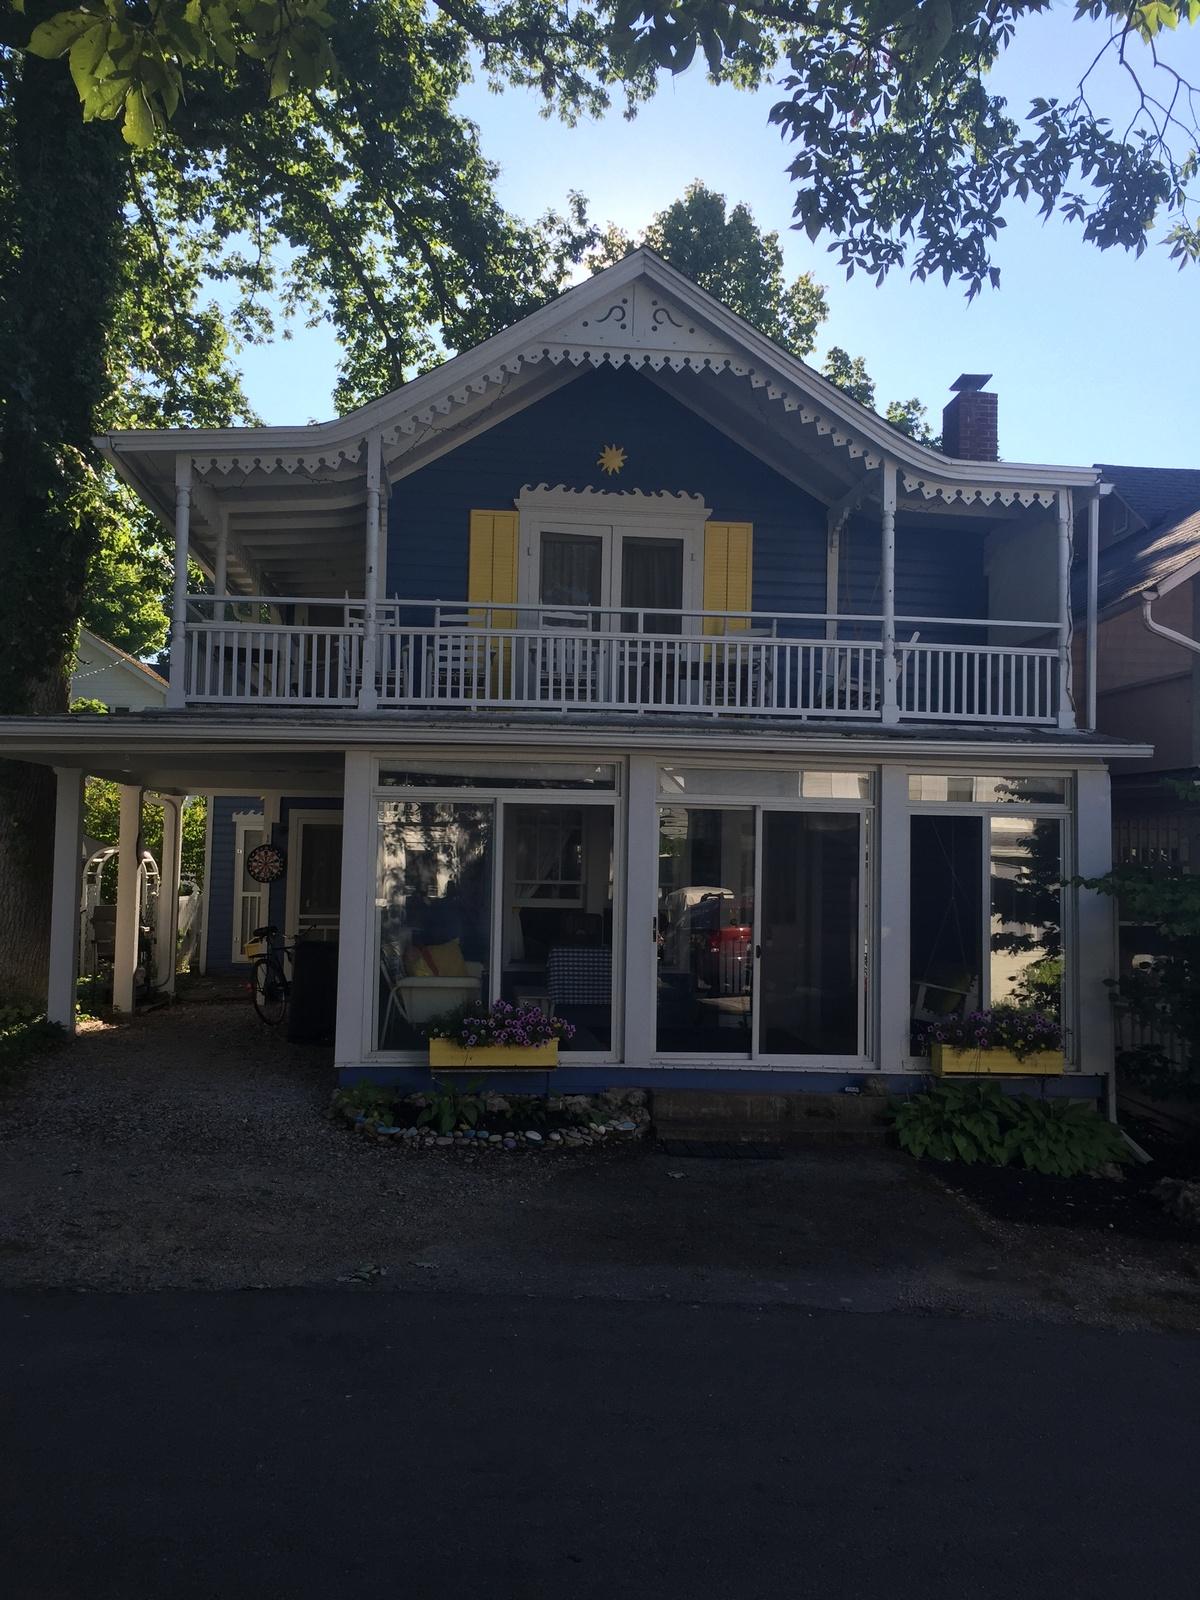 Single Family Home for Sale at 222 Sycamore Avenue Lakeside, Ohio 43440 United States